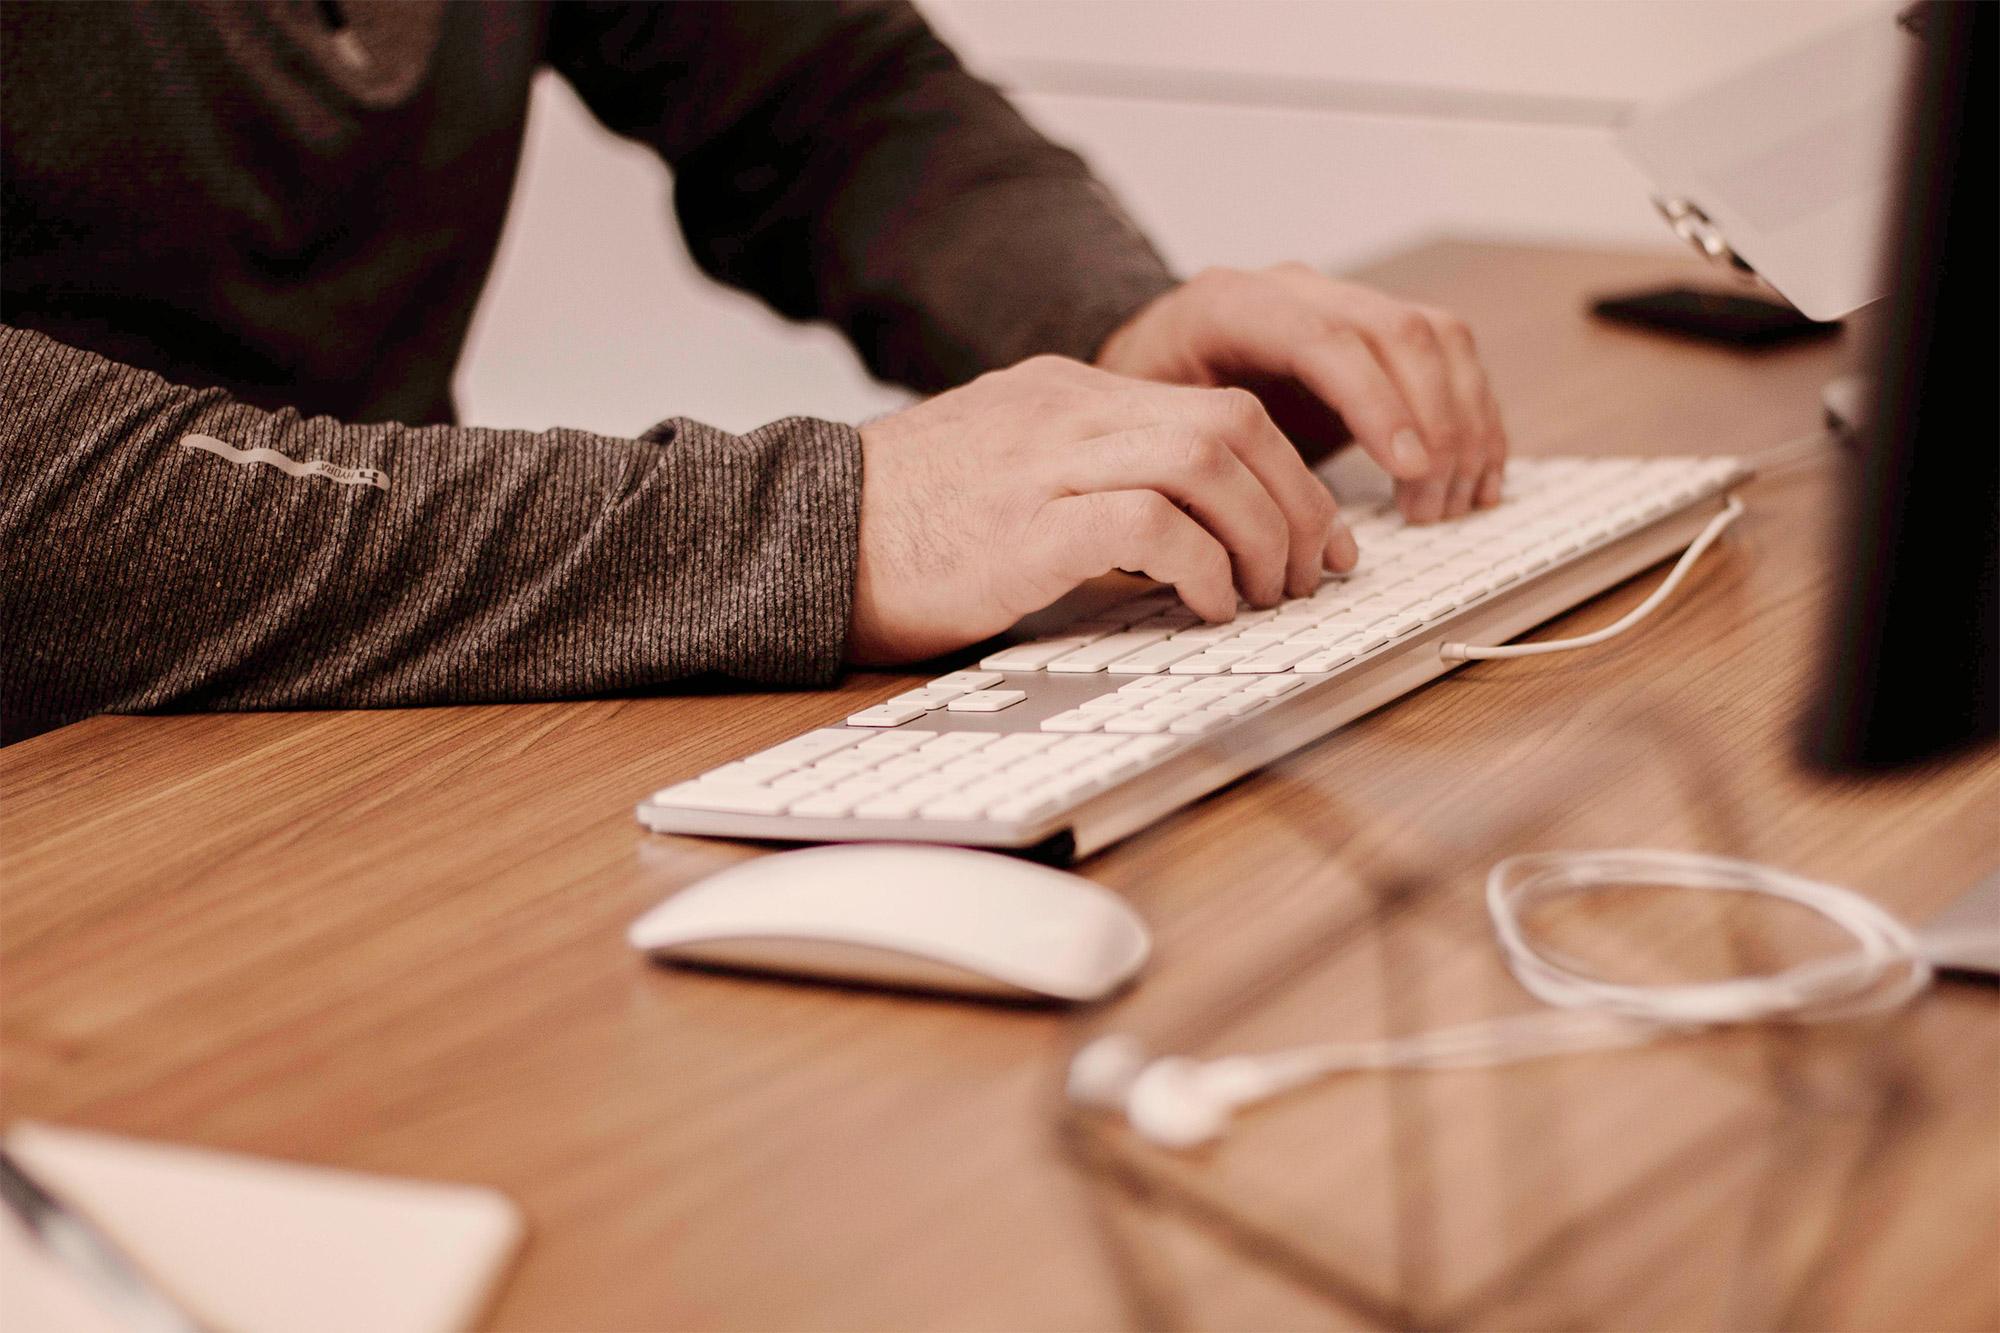 squar-office-typing-on-keyboard.jpg